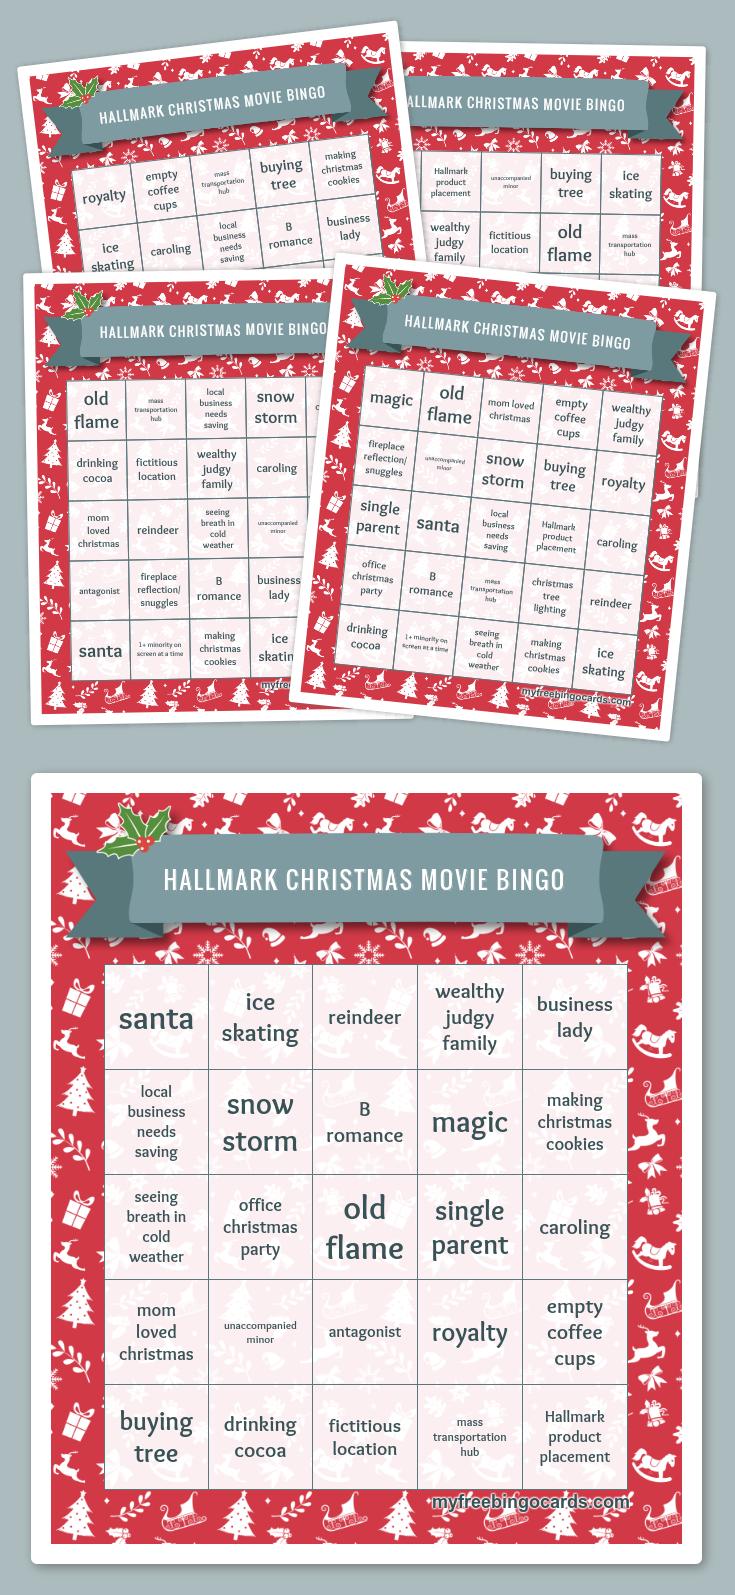 Hallmark Christmas Movie Bingo Christmas bingo, Hallmark